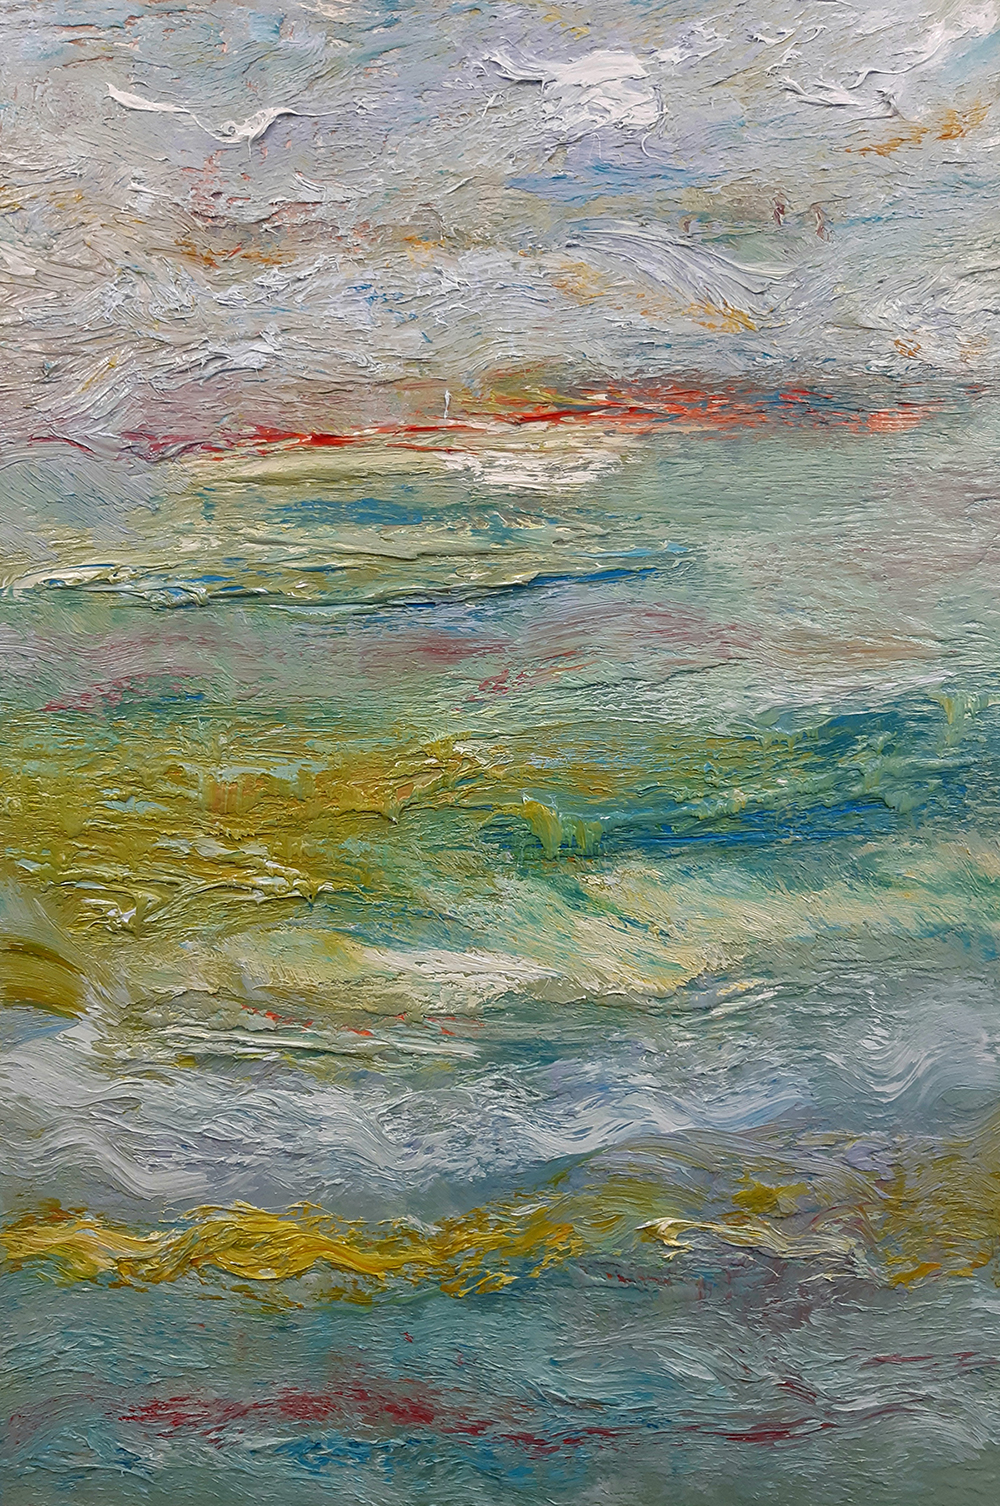 Fragments - oil on canvas - 97 x 66cm